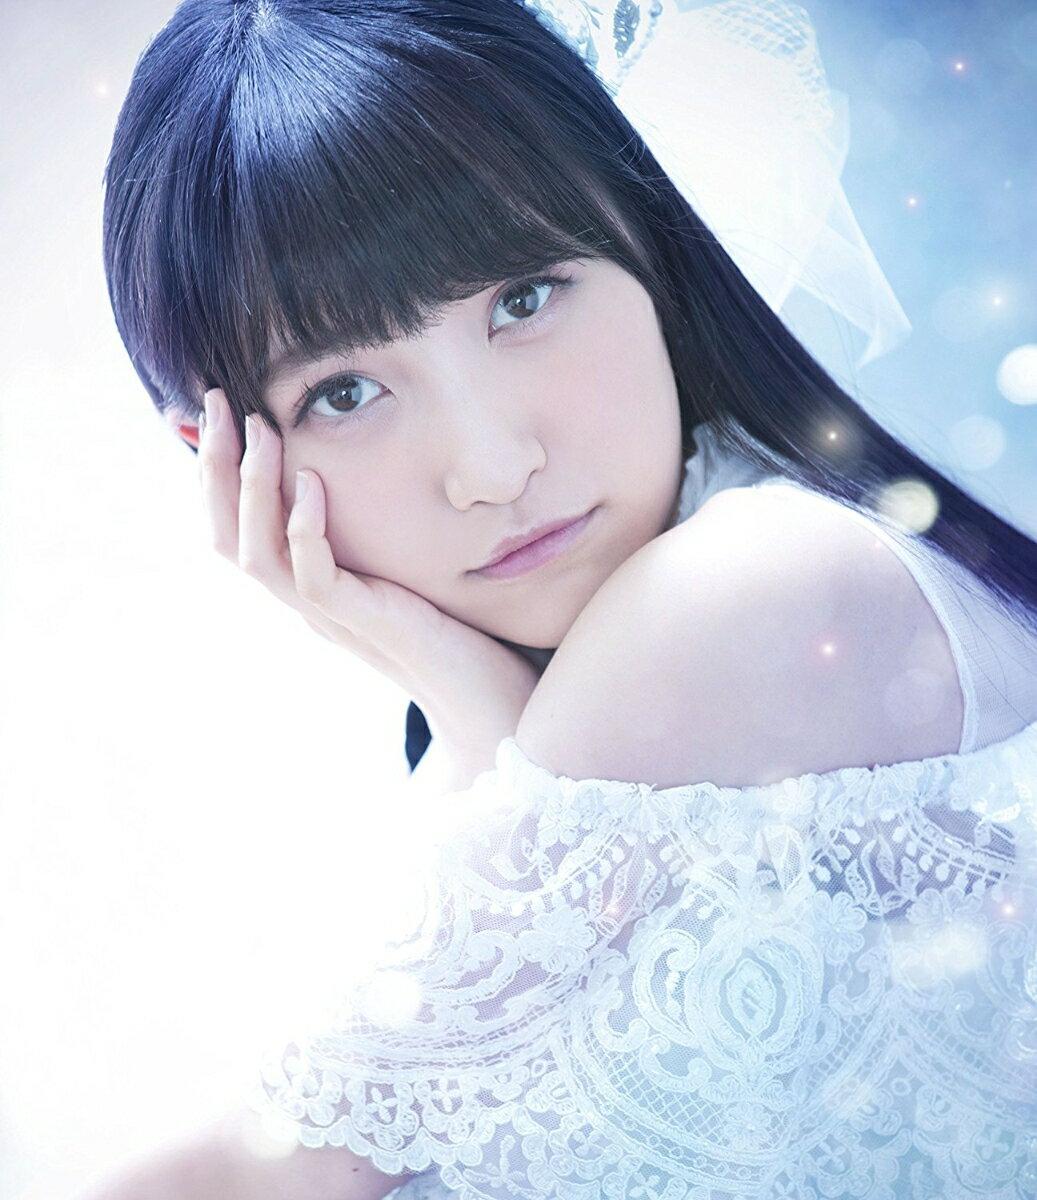 TVアニメ『七星のスバル』エンディングテーマ「Starlight」 (初回限定盤 CD+DVD) [ 山崎エリイ ]